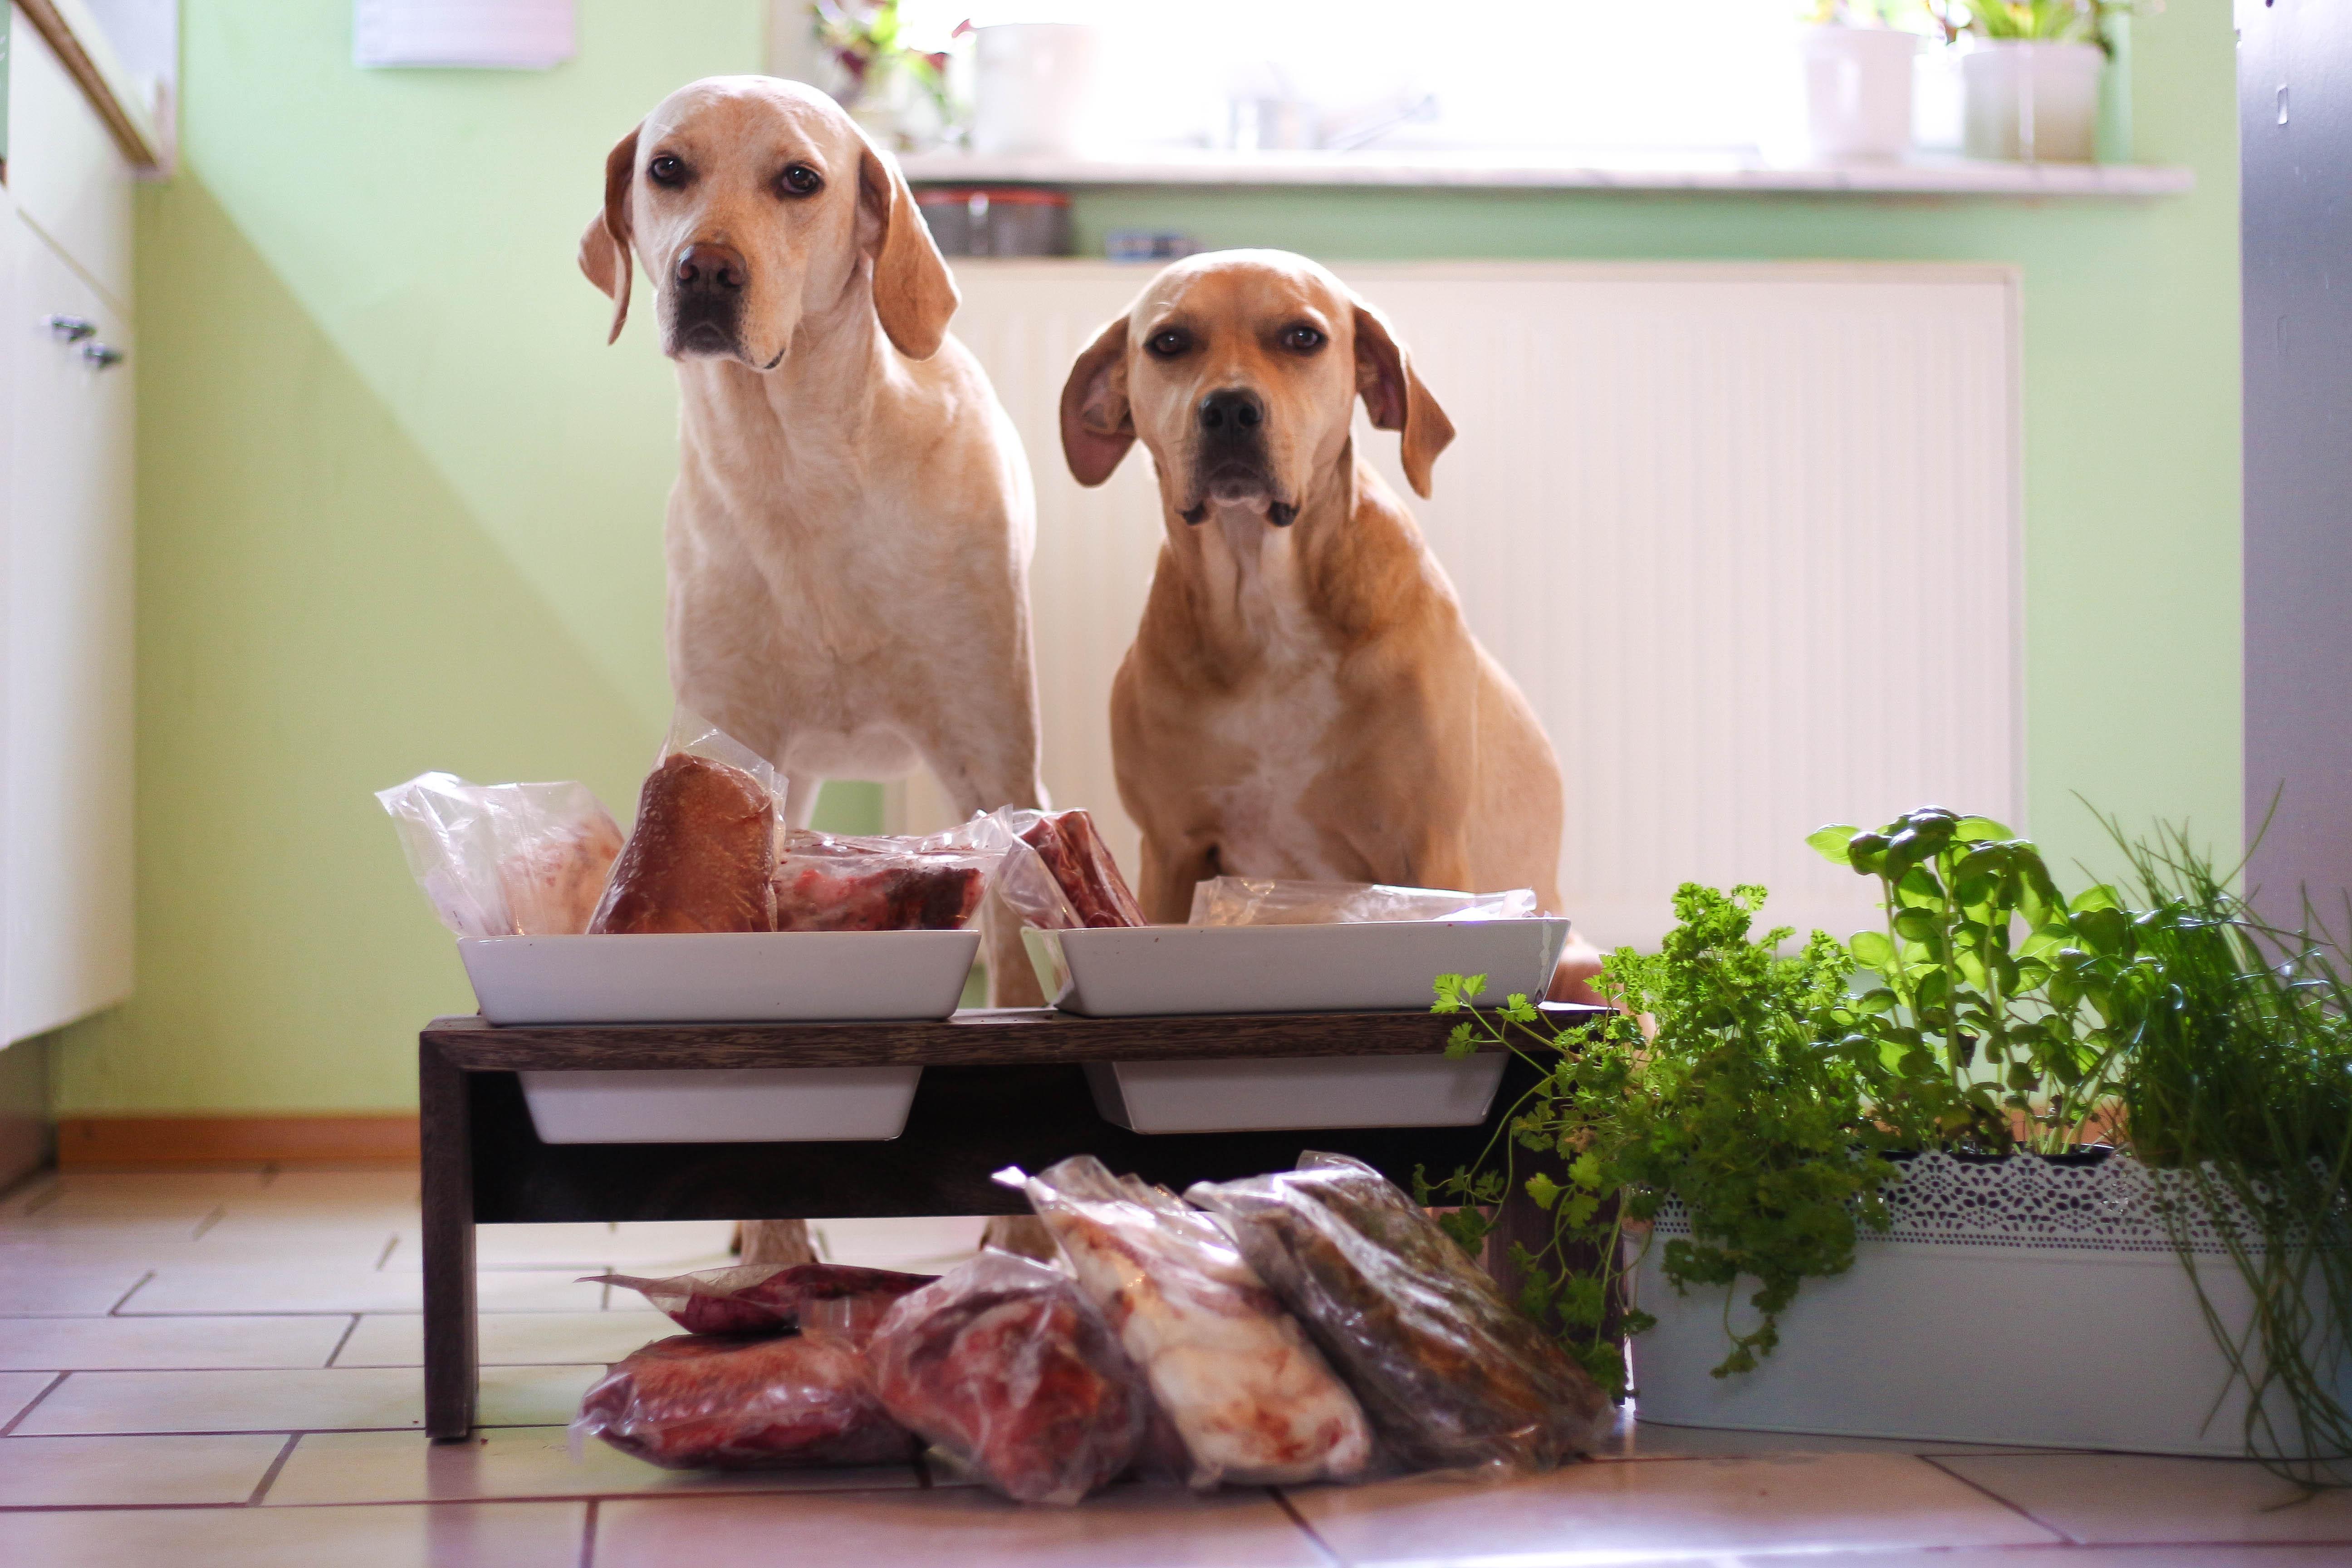 B.A.R.F. 1 Die artgerechte Ernährung für Hunde!